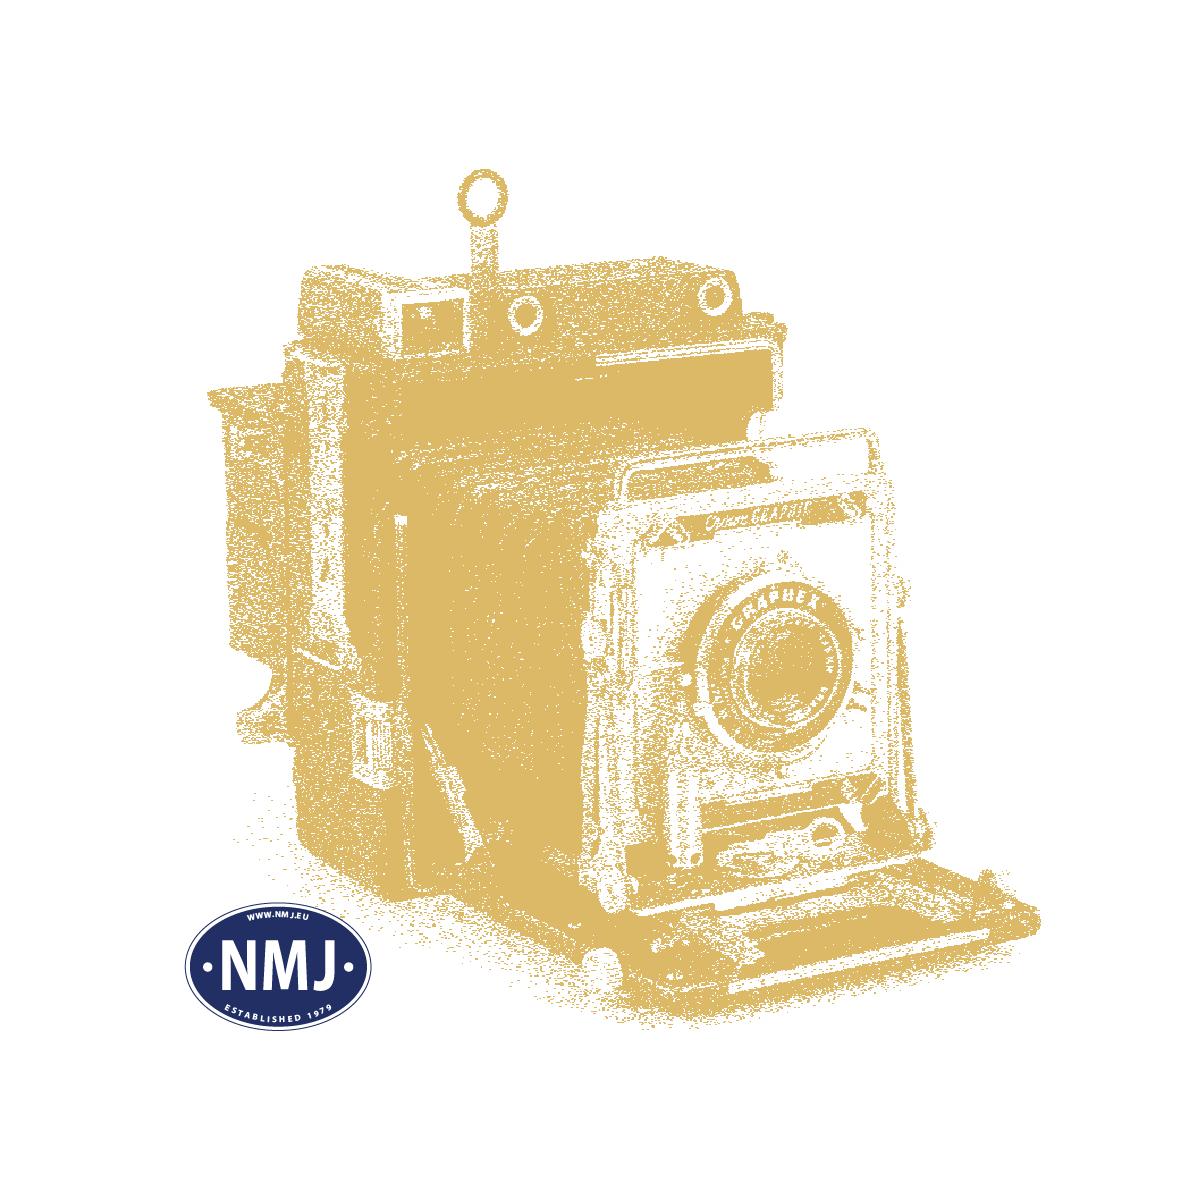 "NMJT110.303 - NMJ Topline NSB FR3-2 21266 ""Bistro"""